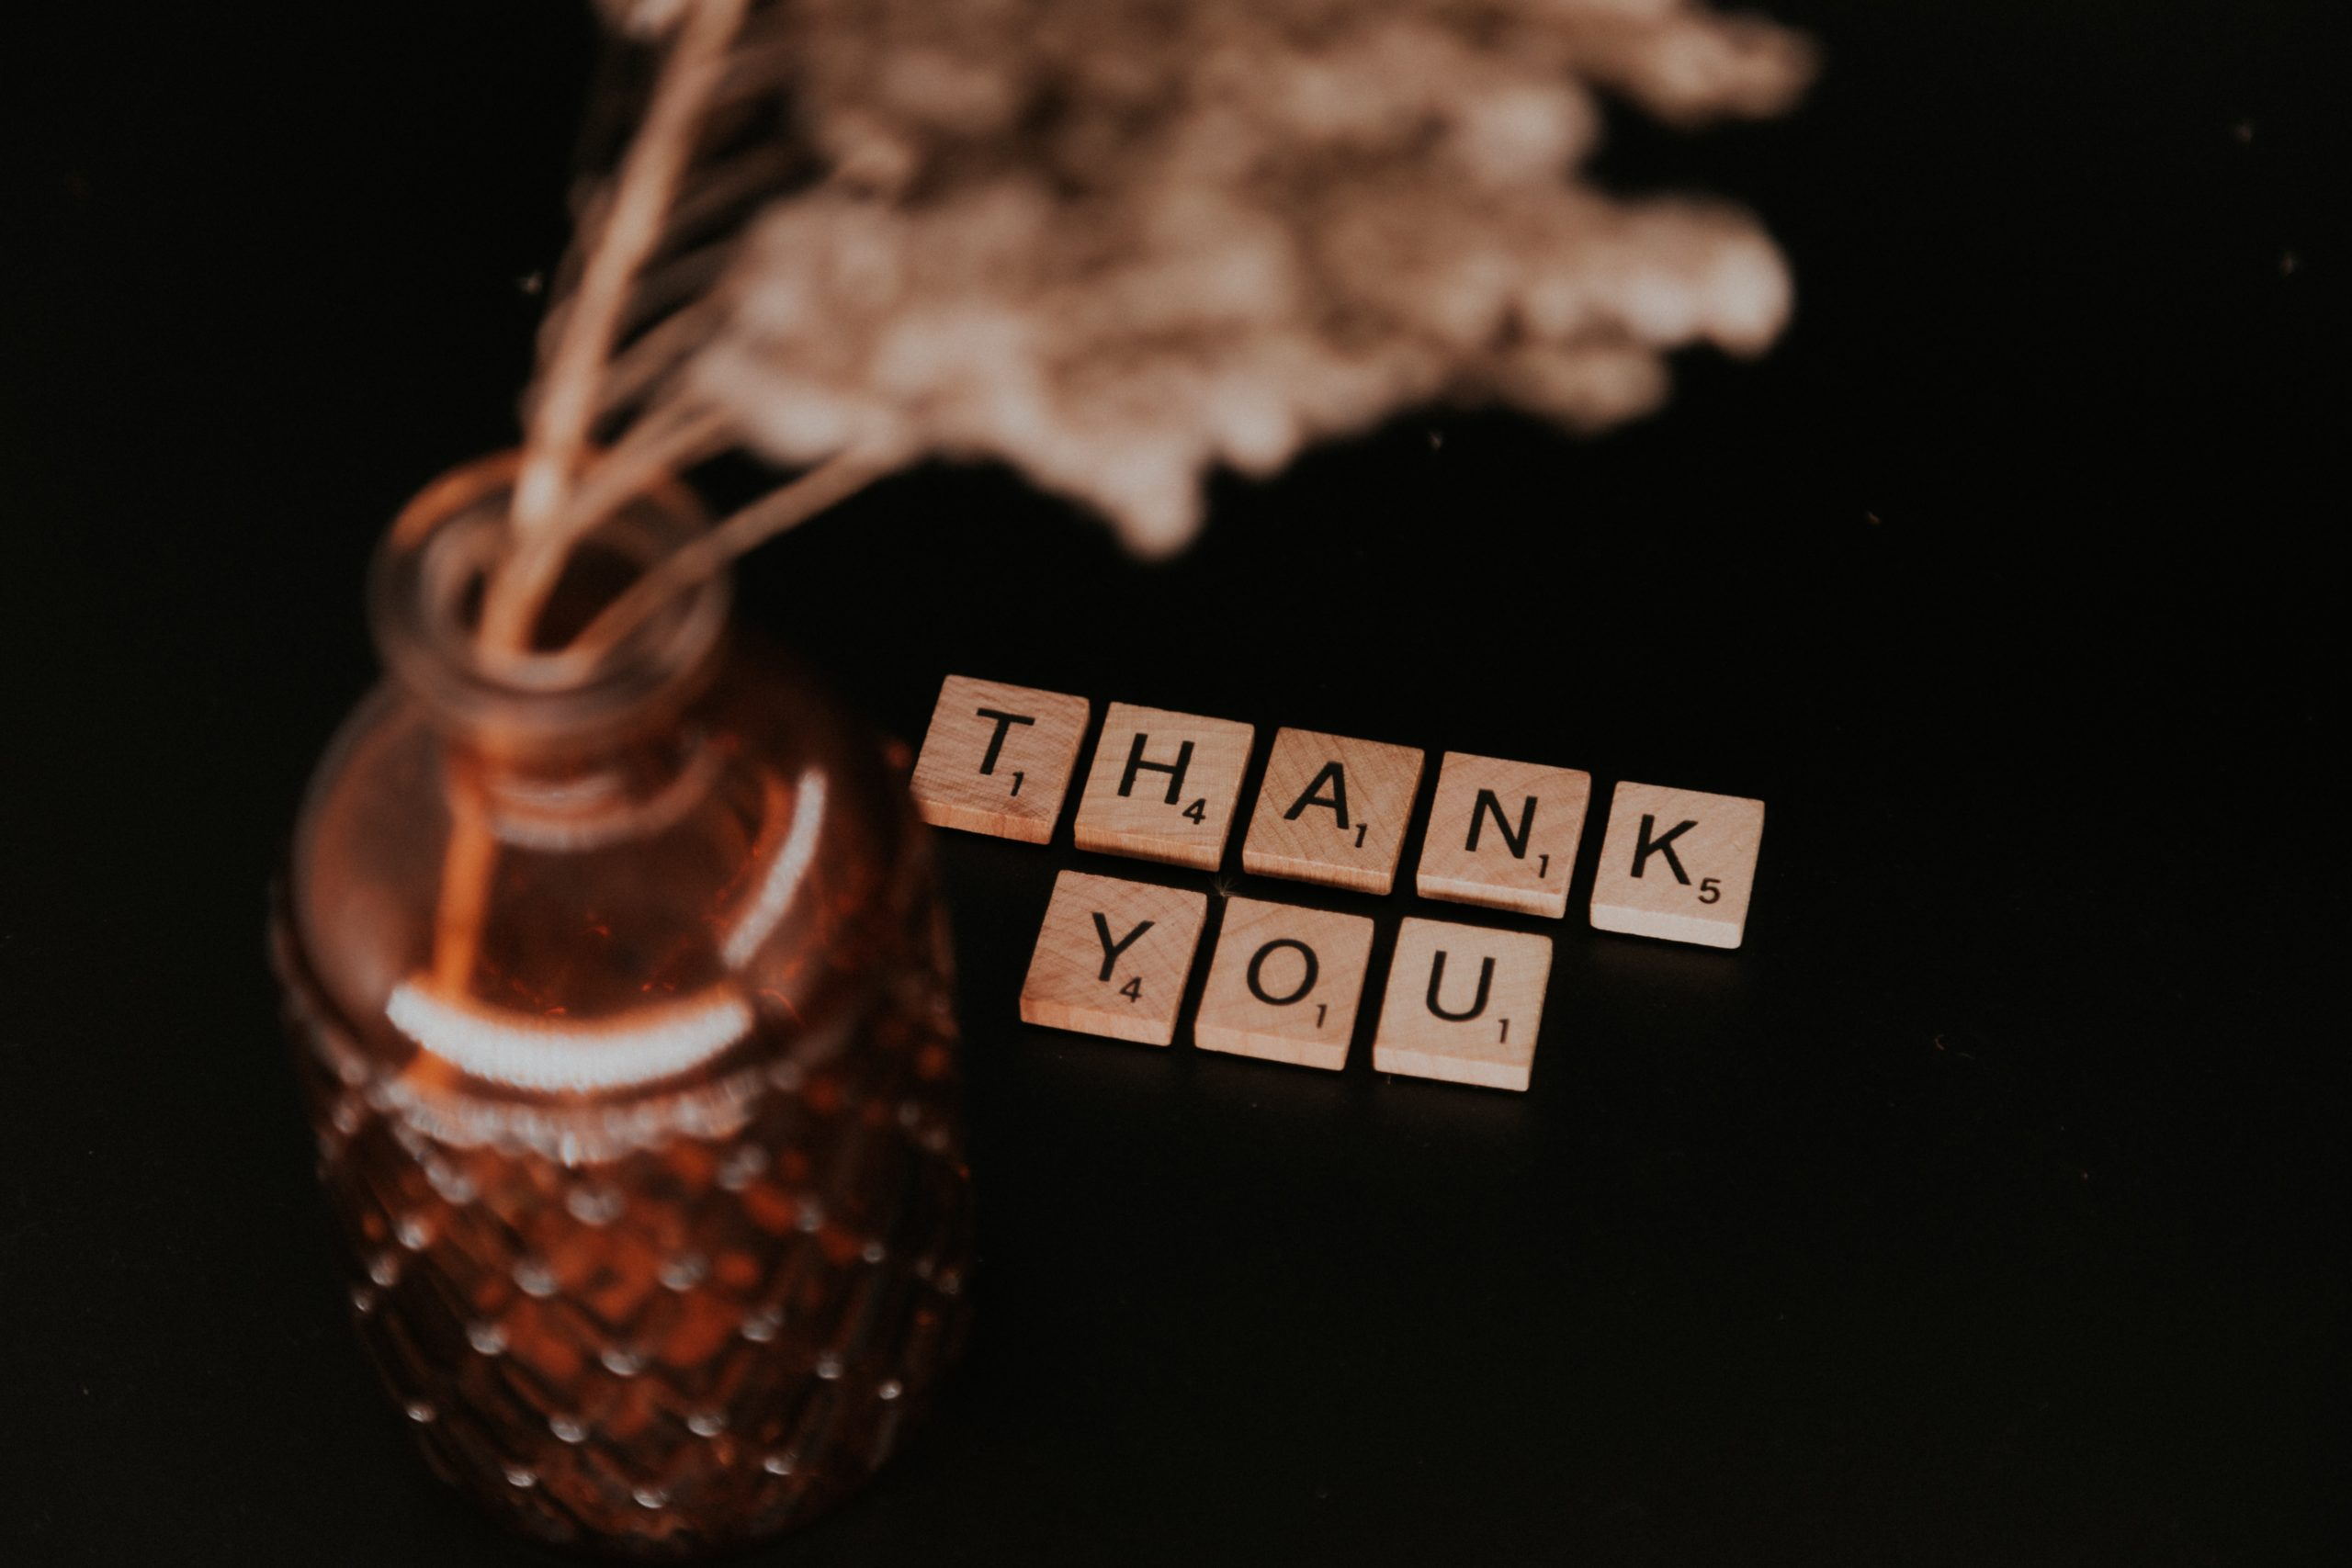 An intention of gratitude